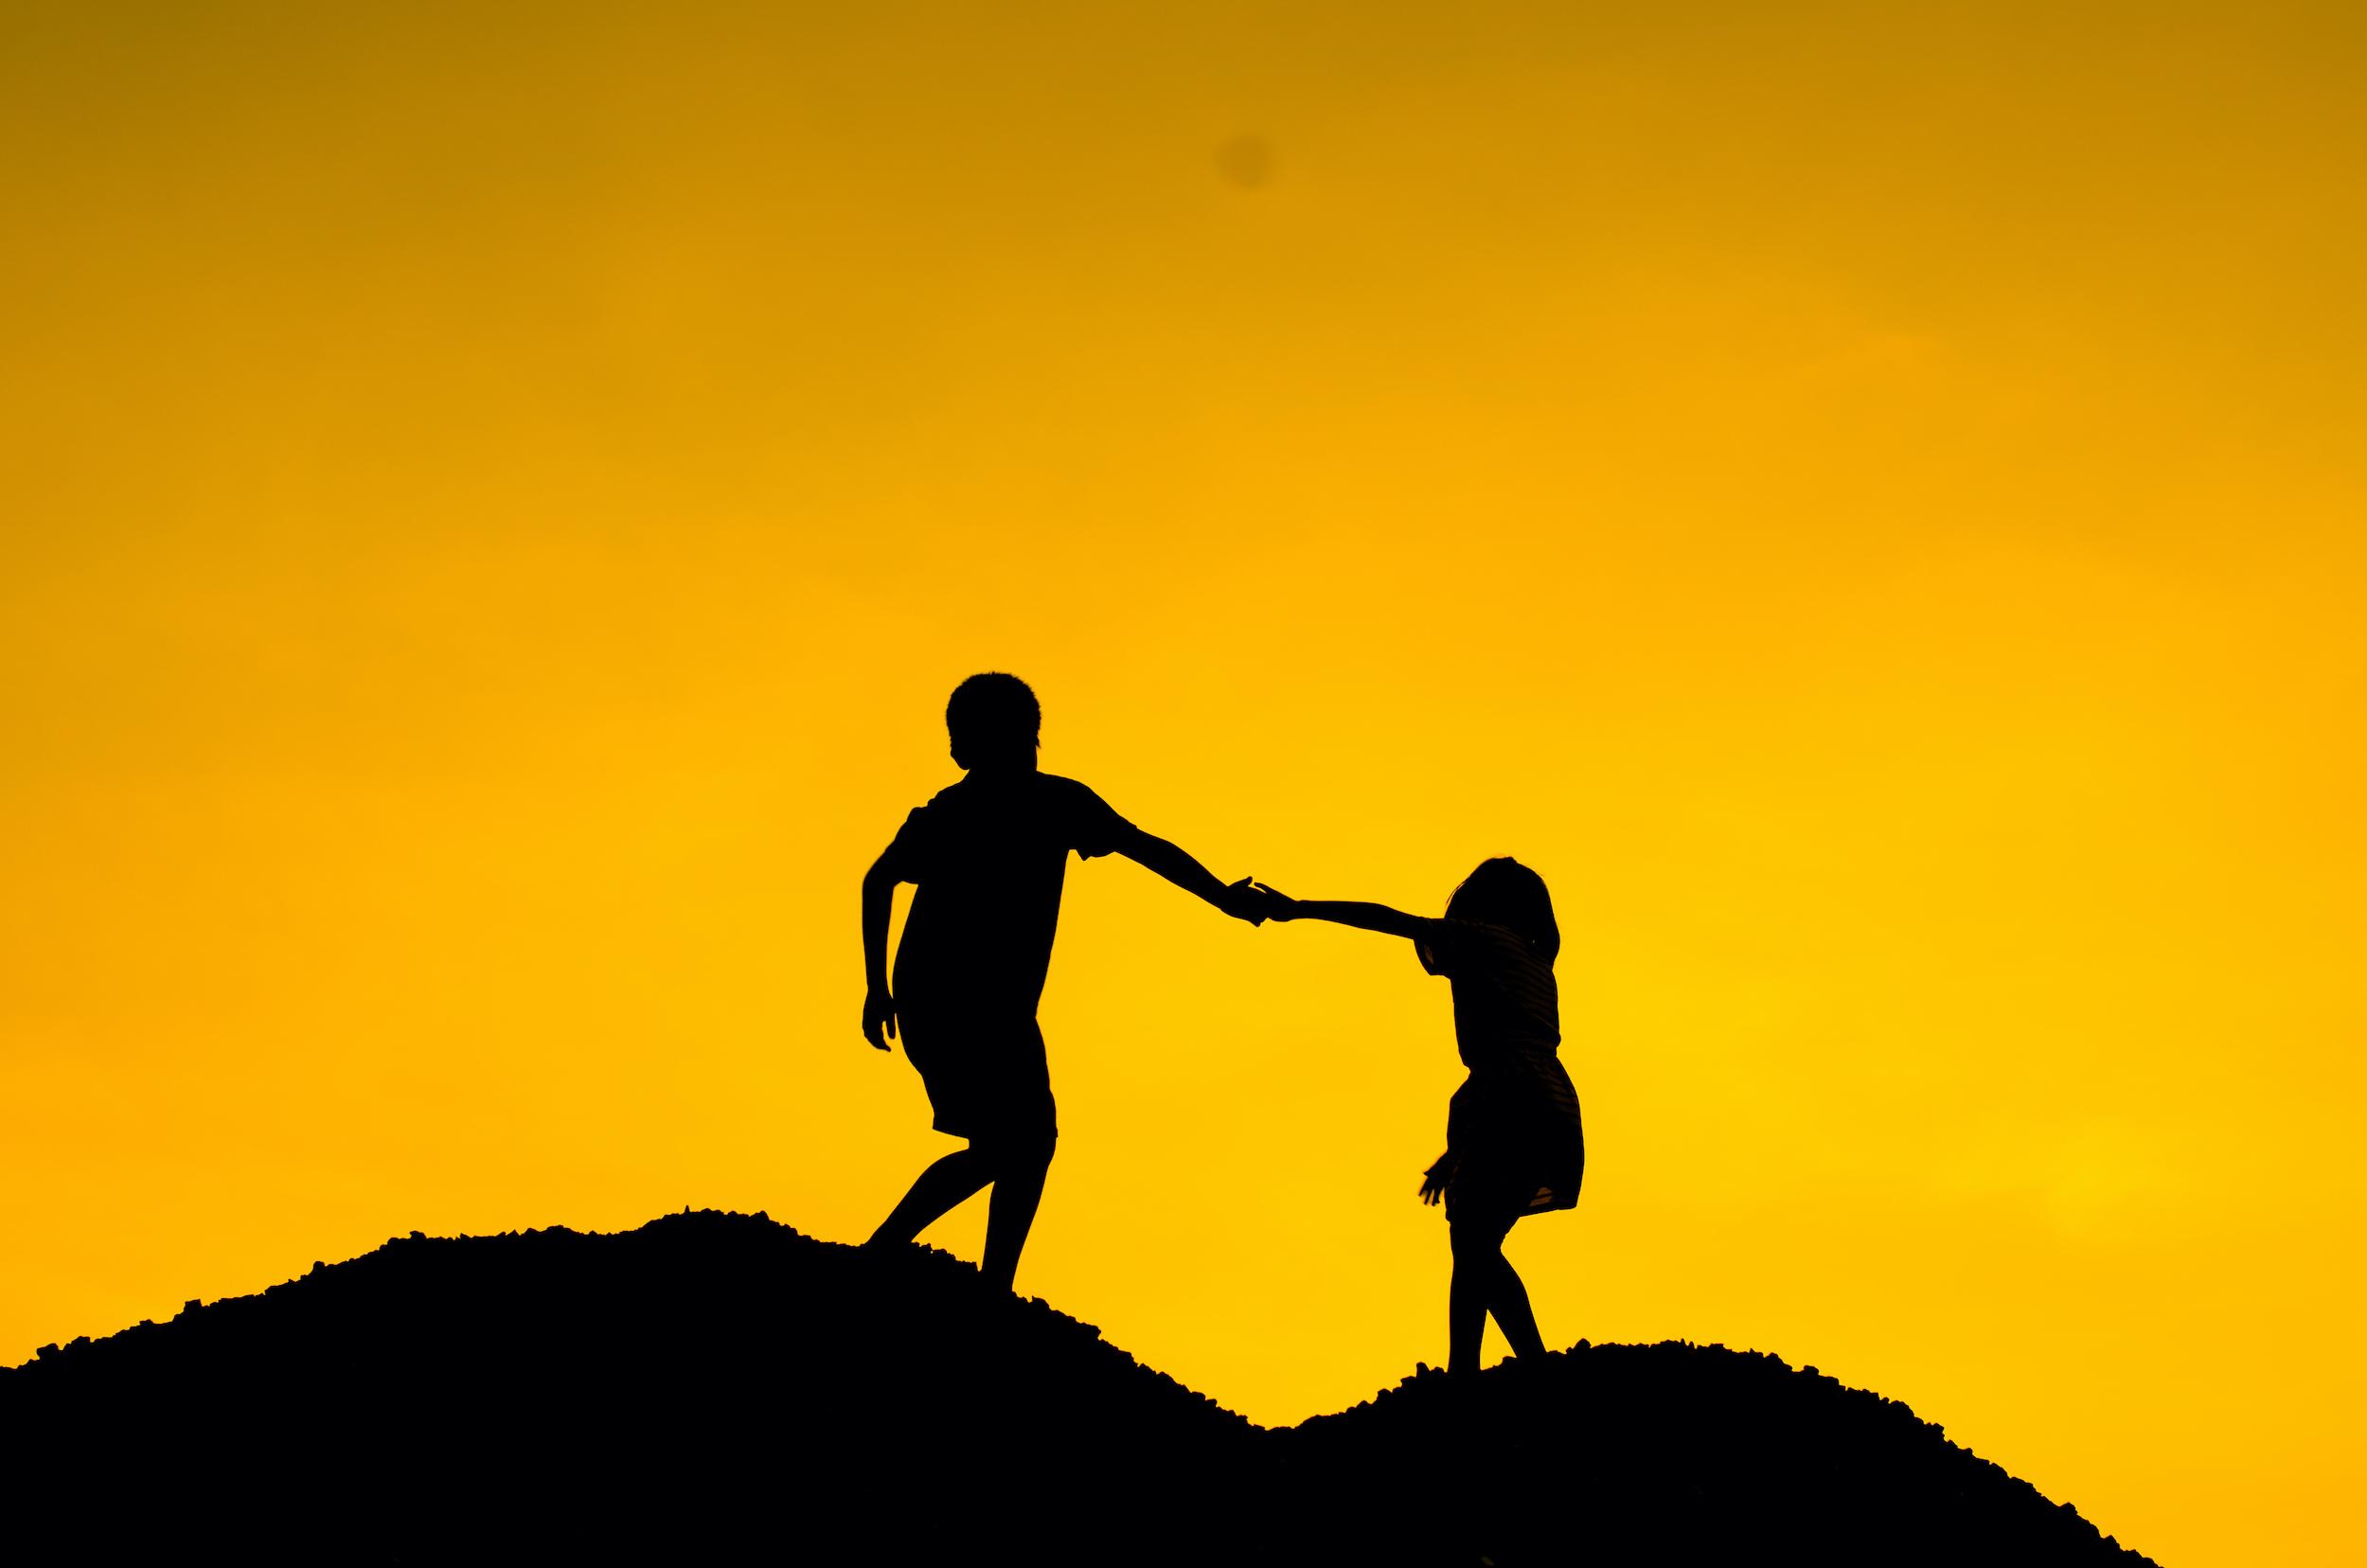 Boy holding girl hand for climbing higher, mentor concept.